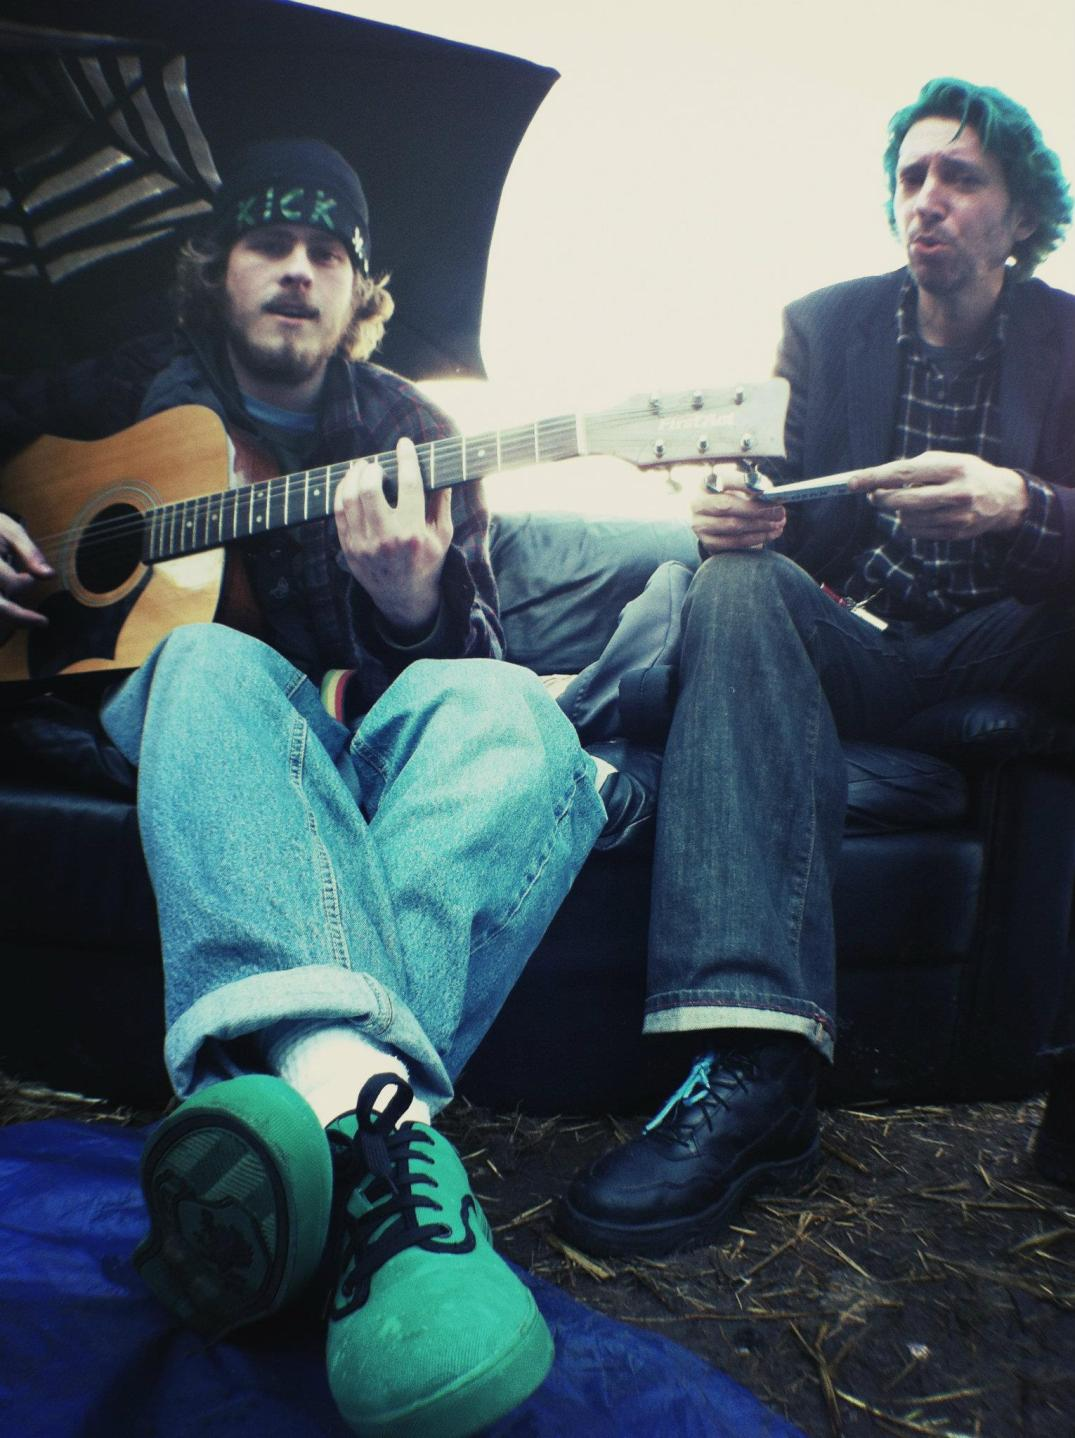 Occupy Guitarist